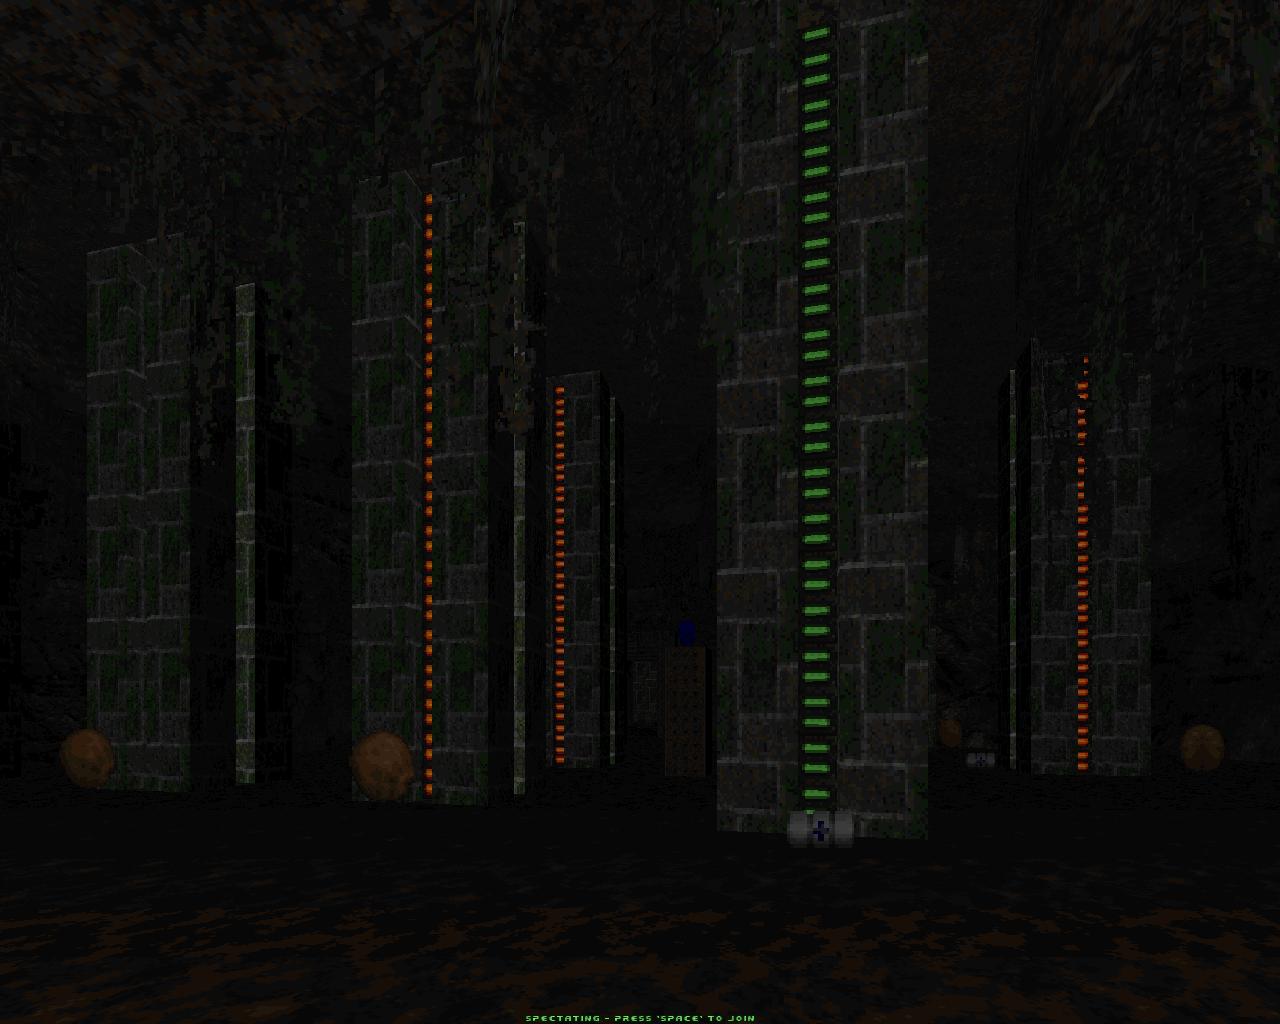 Screenshot_Doom_20201124_224450.png.df5a2e4771a8fc4c9c9cc178f2d15efc.png